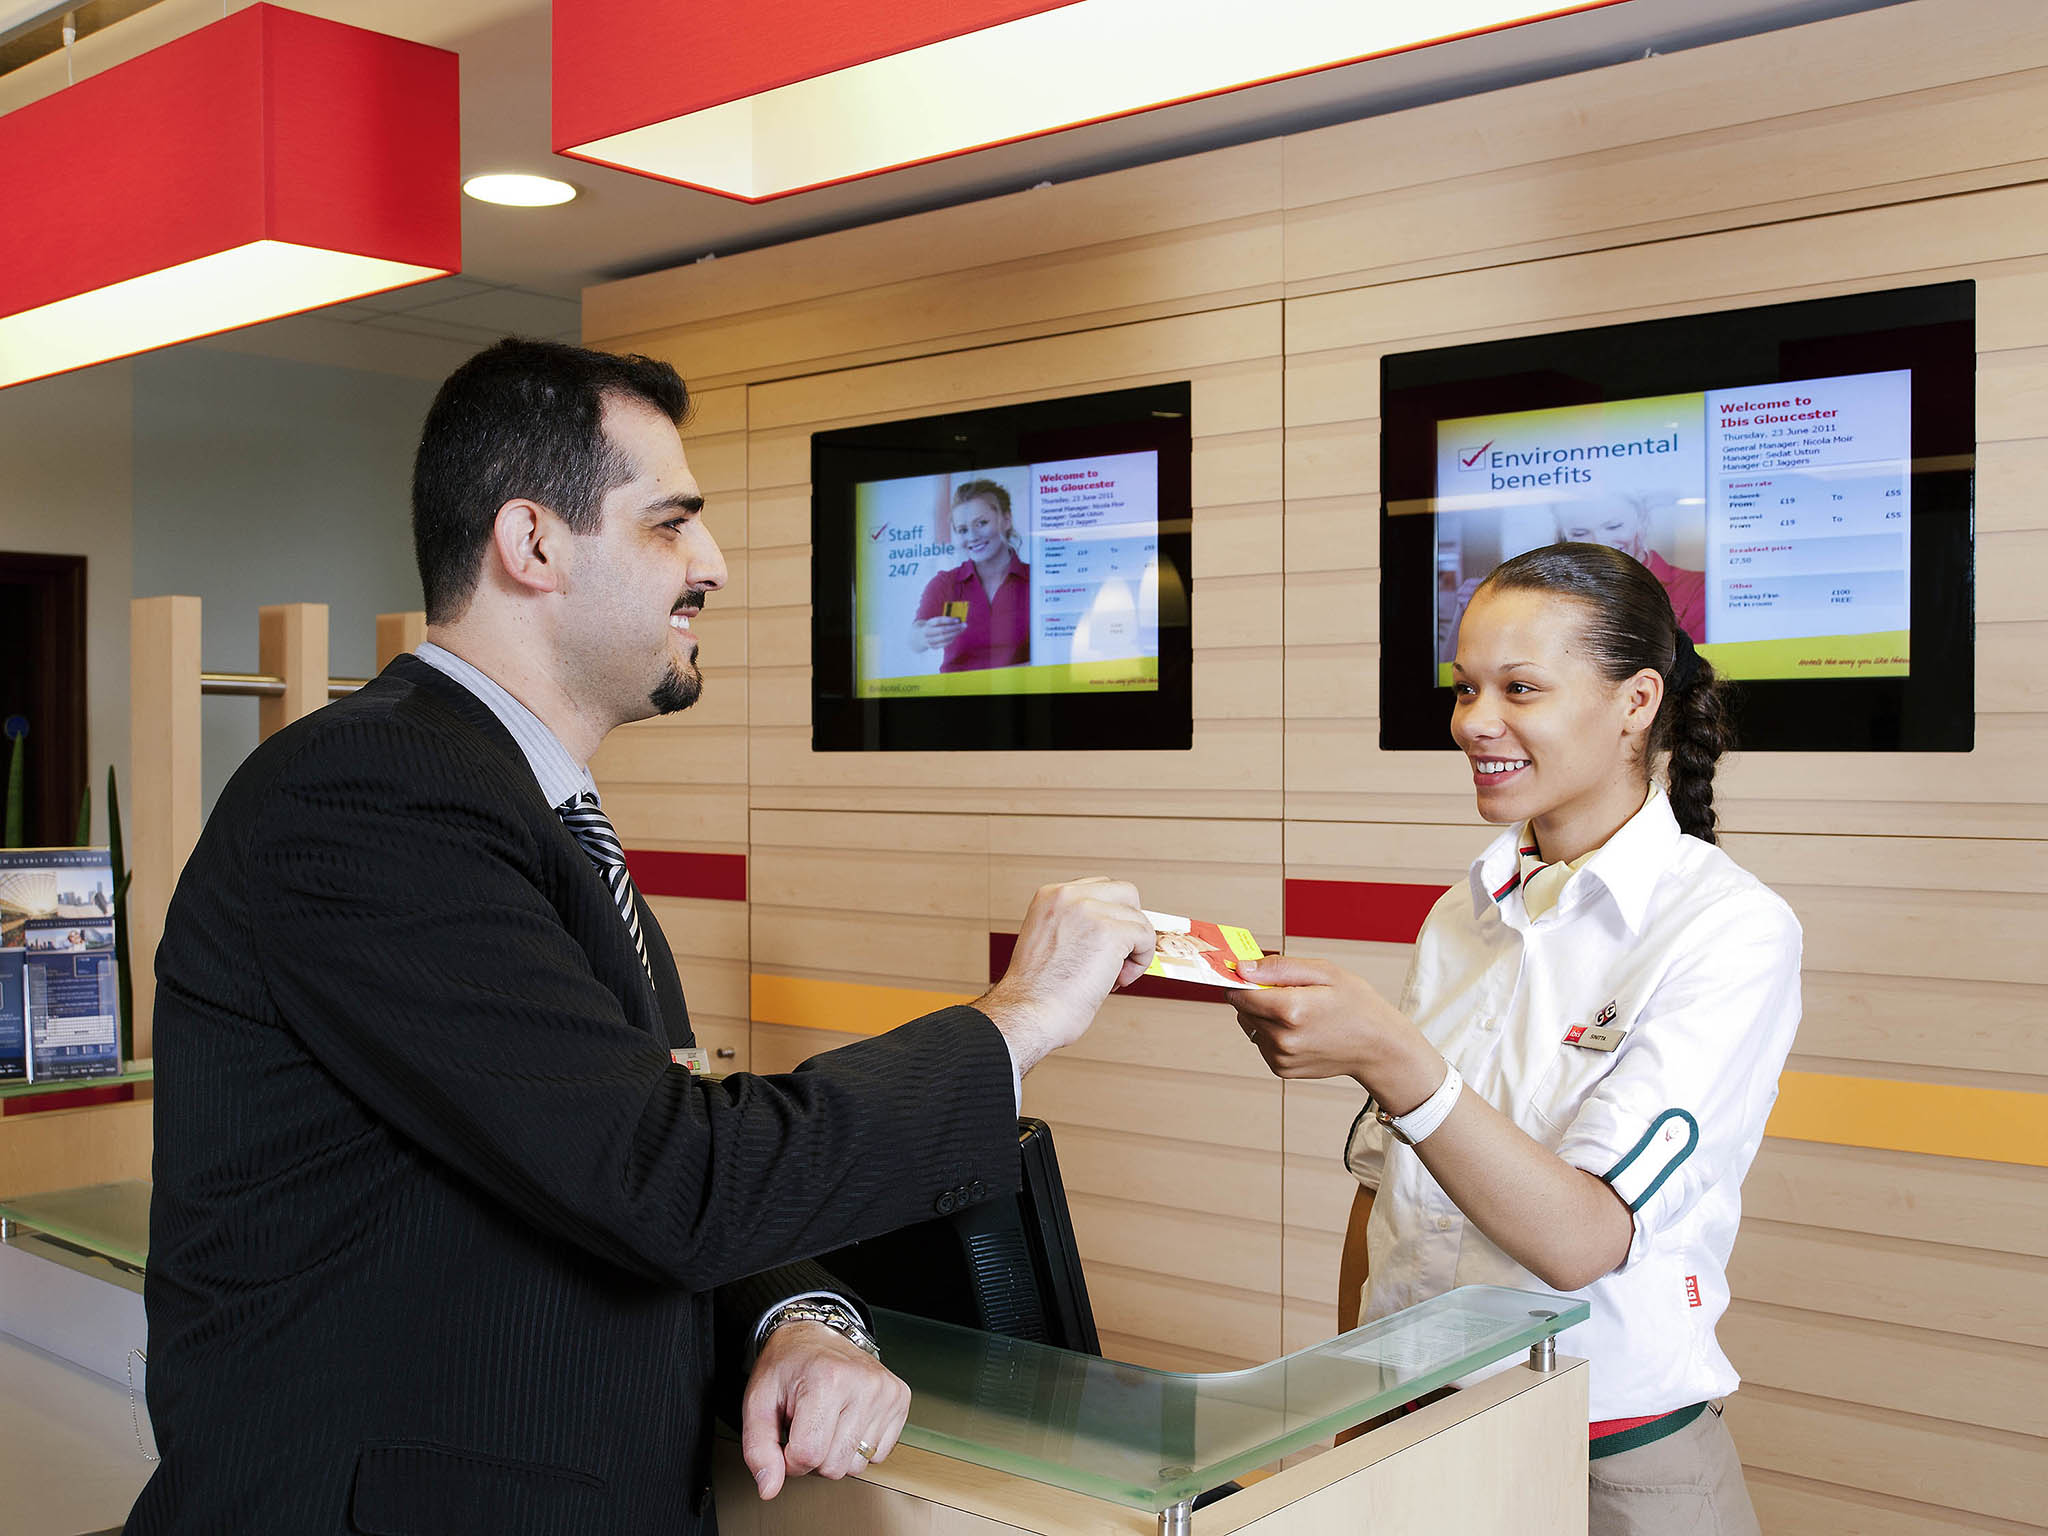 ibis gloucester comfortable modern hotel in gloucester rh meetings accorhotels com